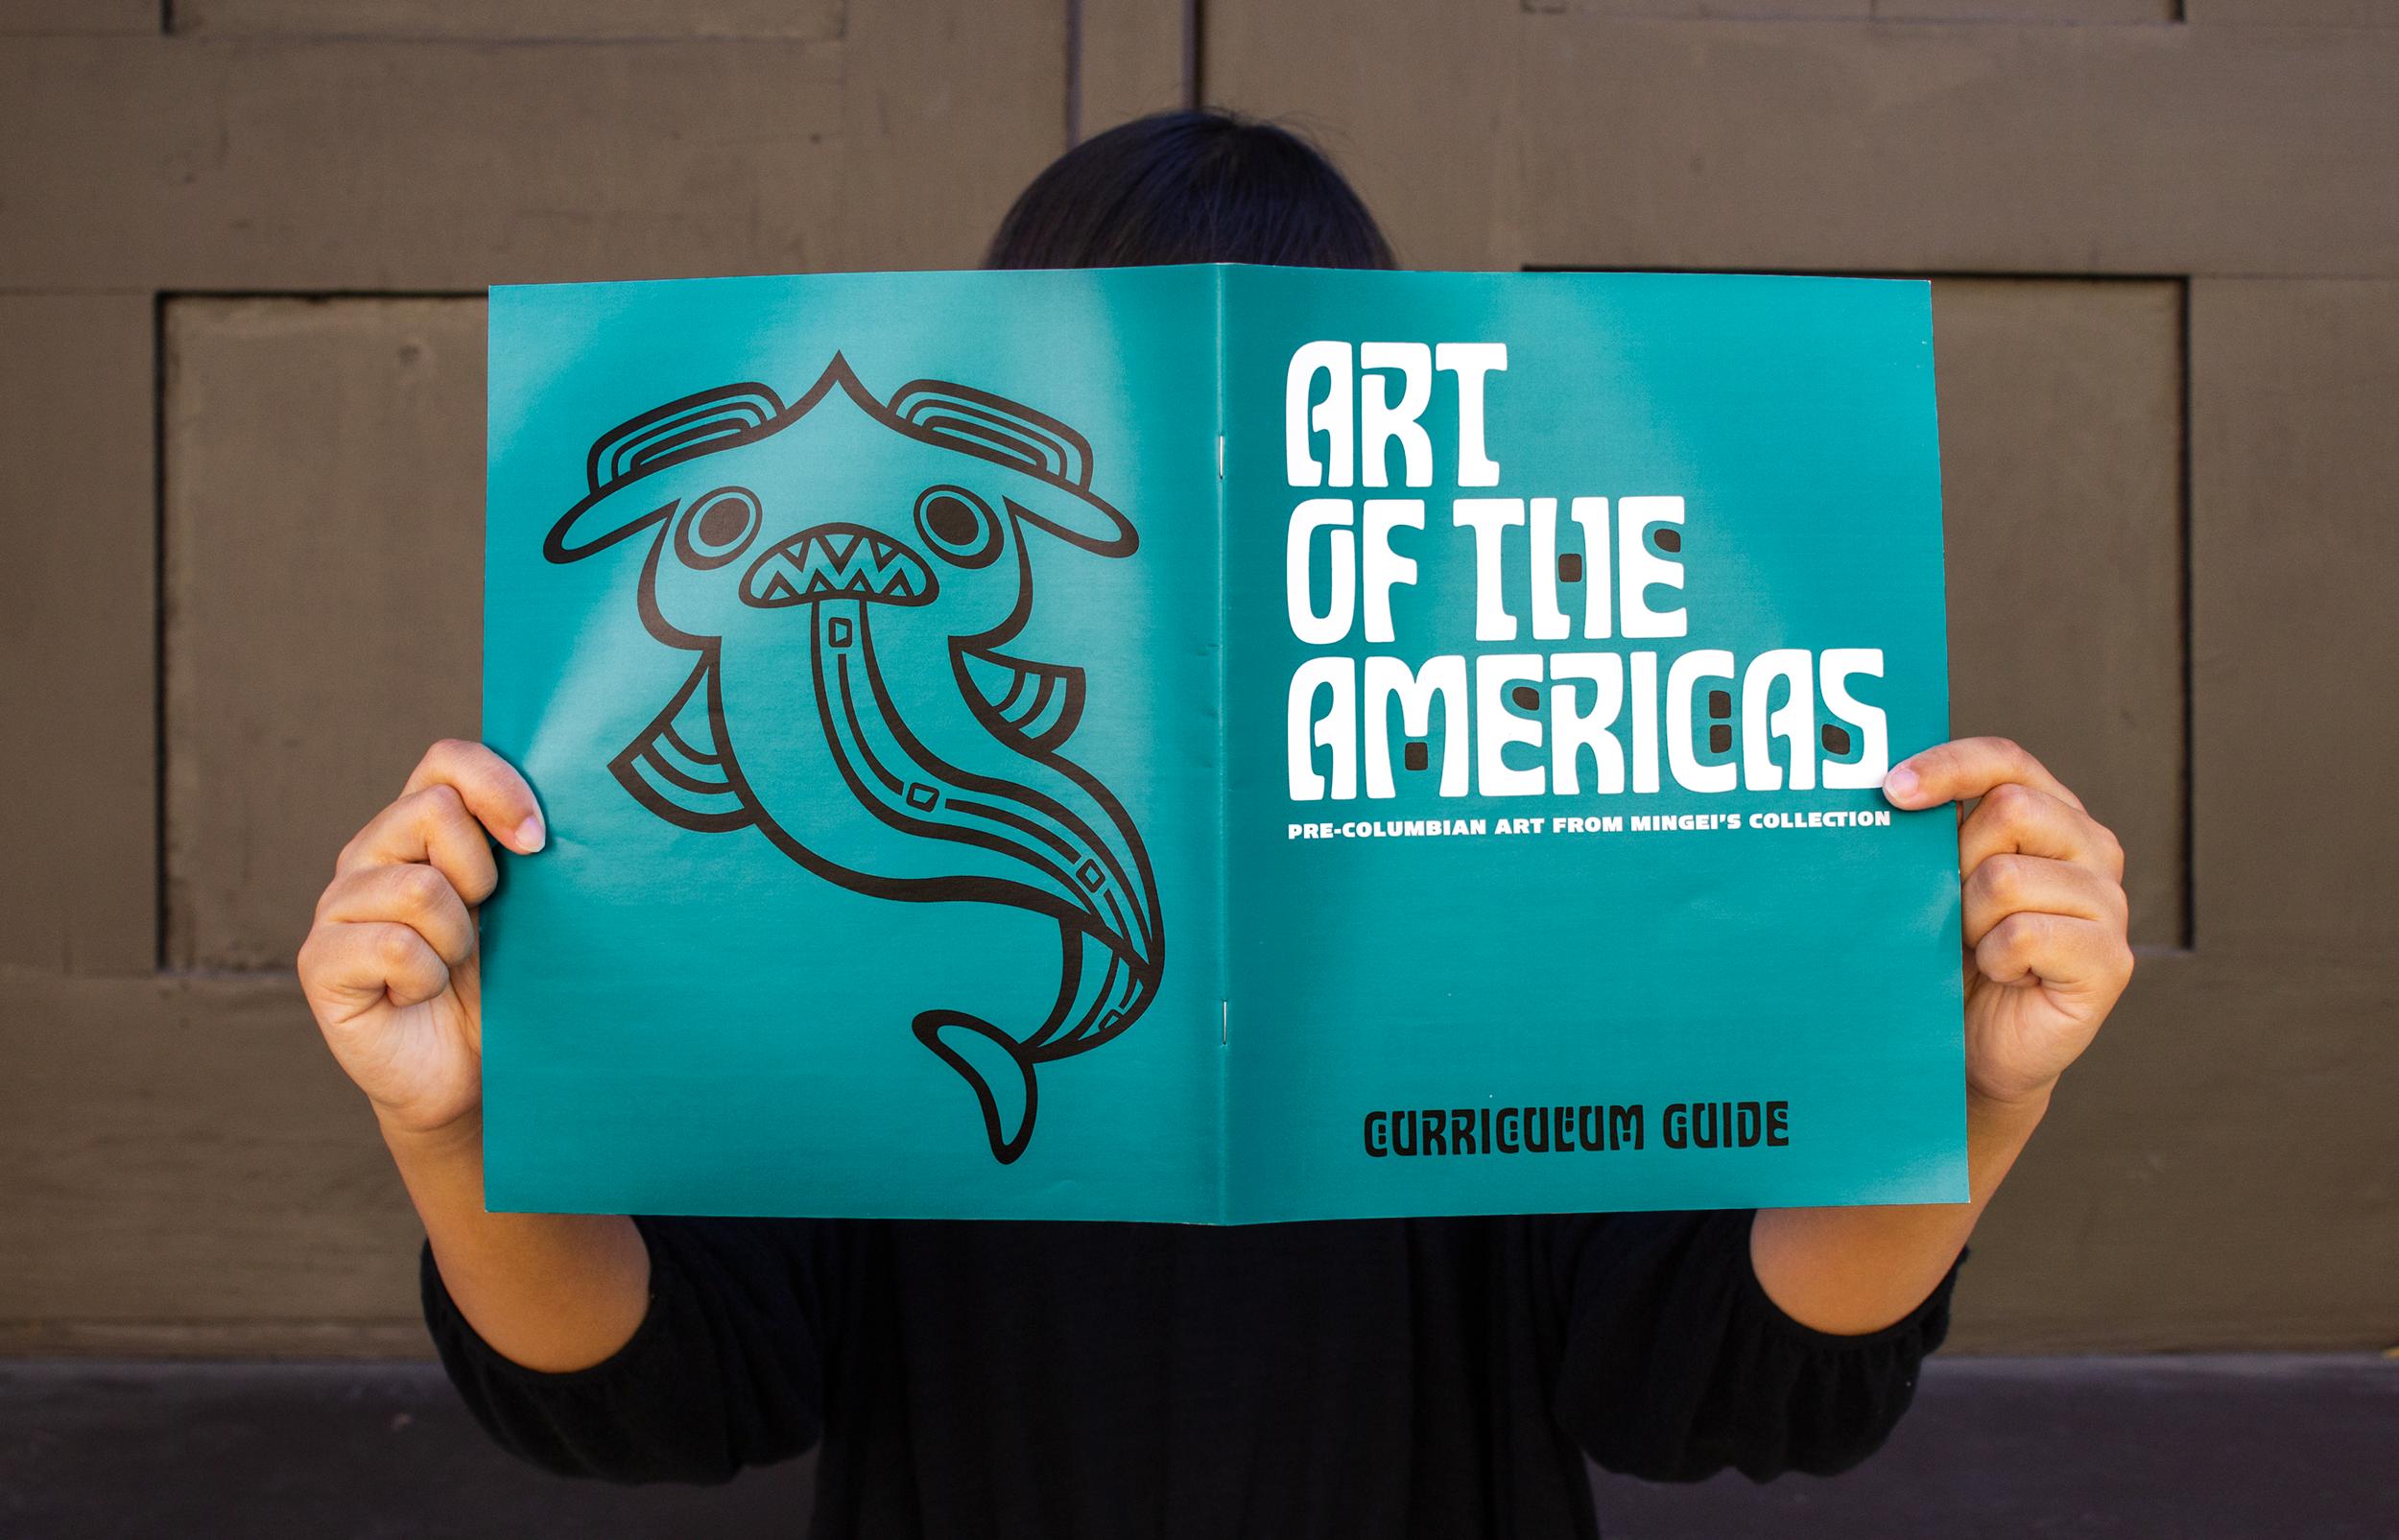 curriculum guide, art of the americas